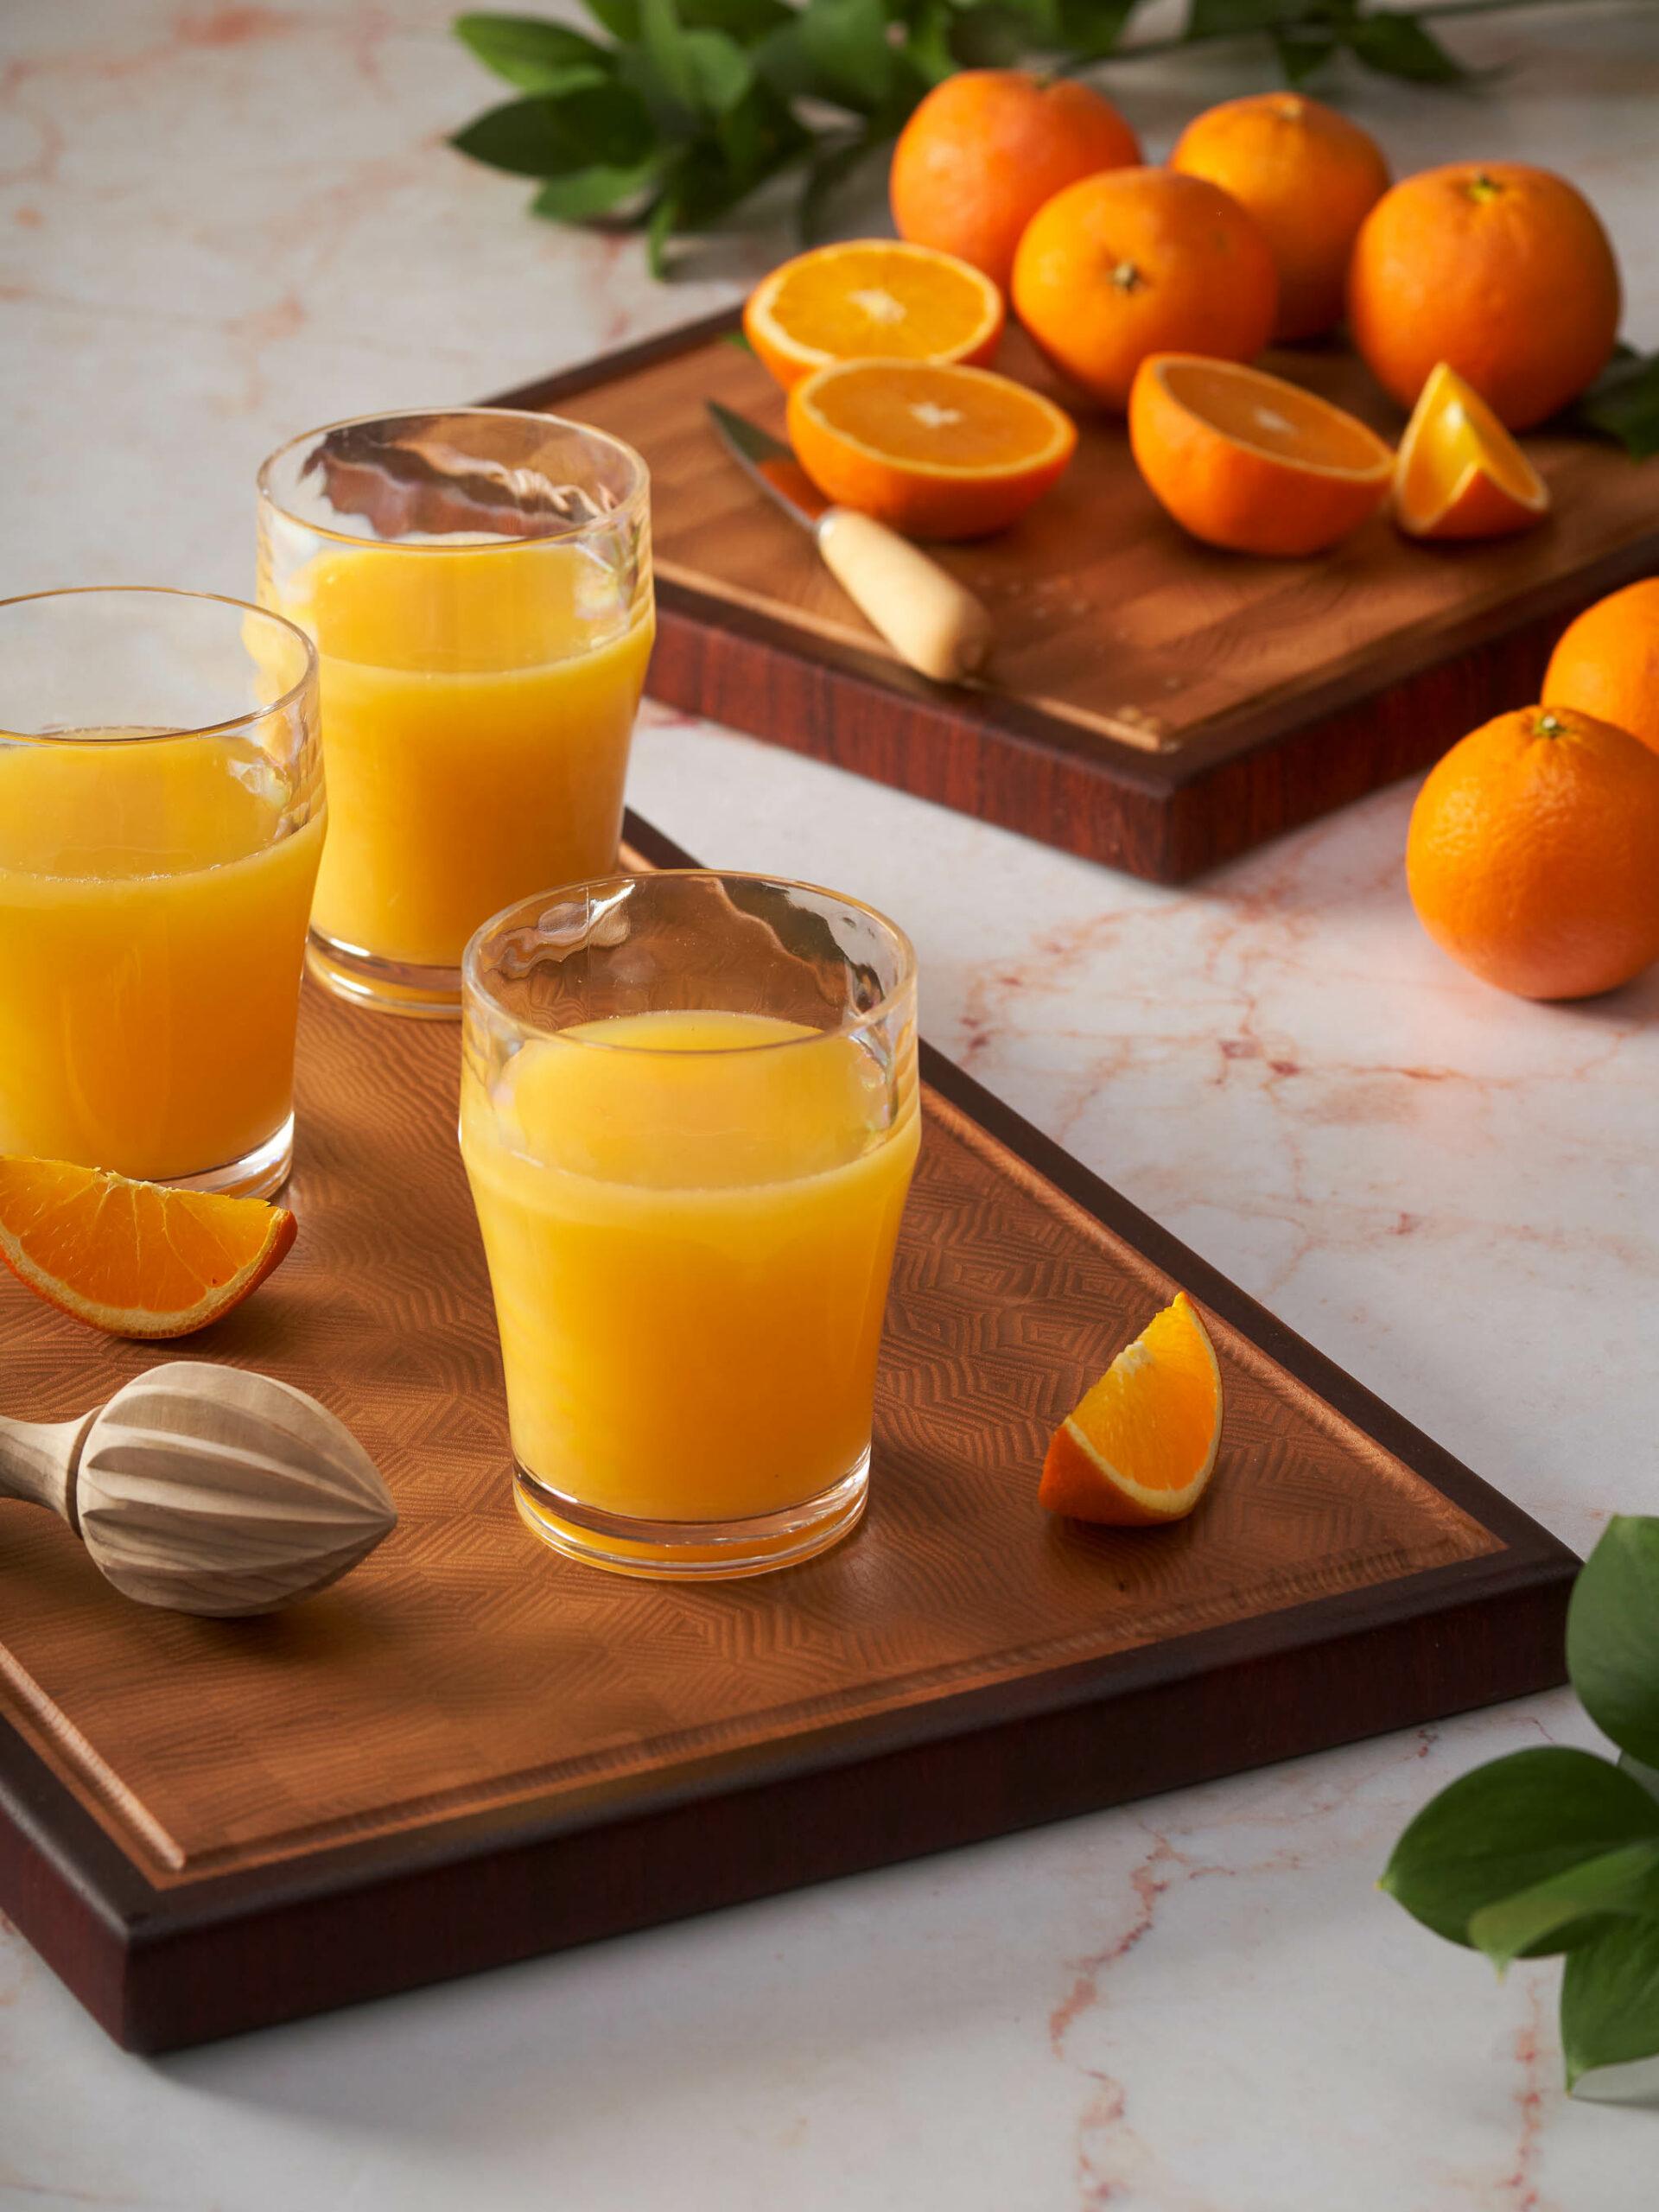 Home economist & food and drink stylist Madrid Zumo de naranja